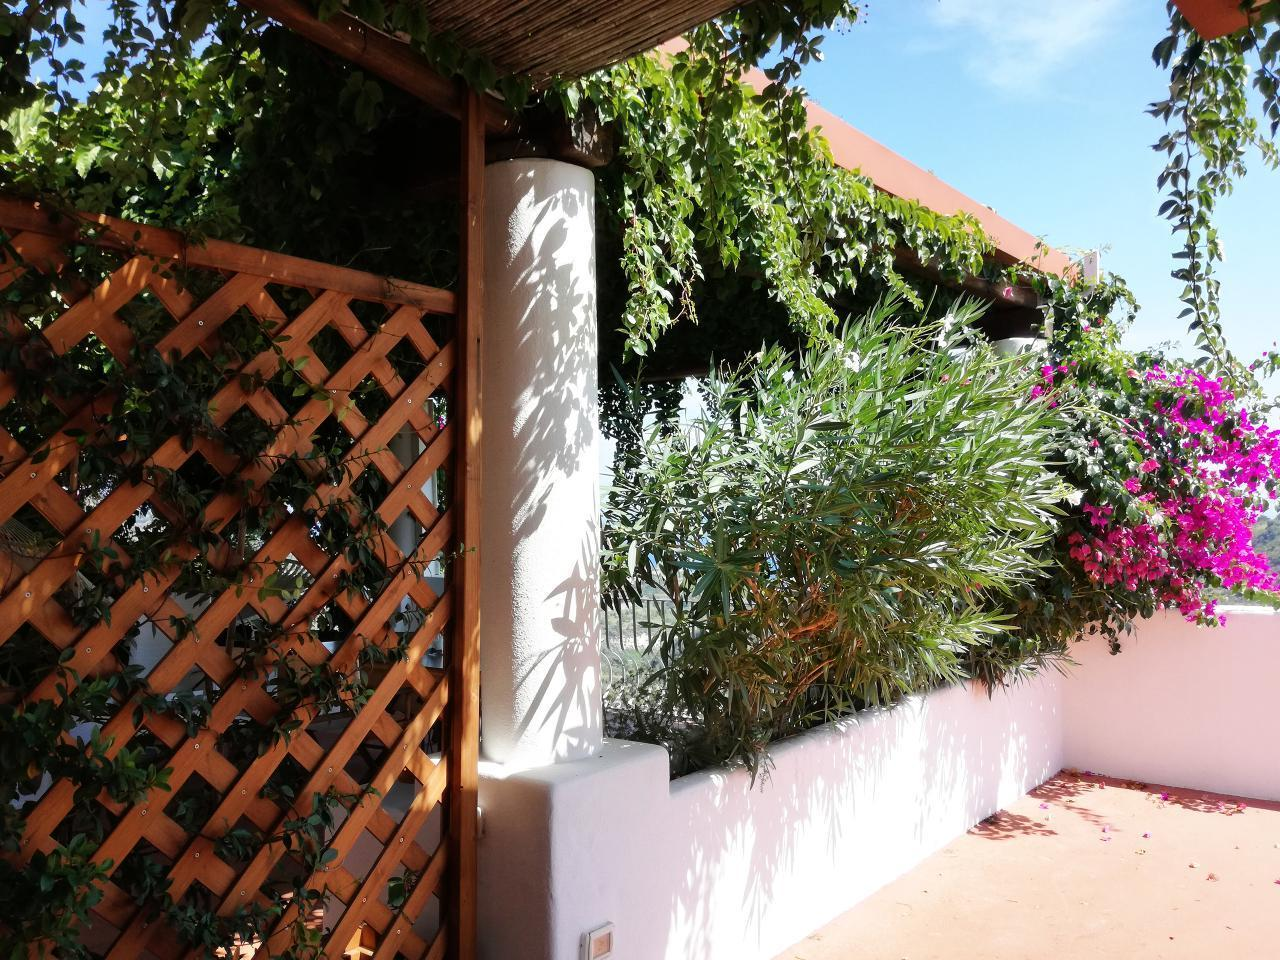 Maison de vacances Ferienhaushälfte Solandra auf sizilianischer Insel mit atemberaubenden Meeres-Rundblick (2038046), Lipari, Lipari, Sicile, Italie, image 58